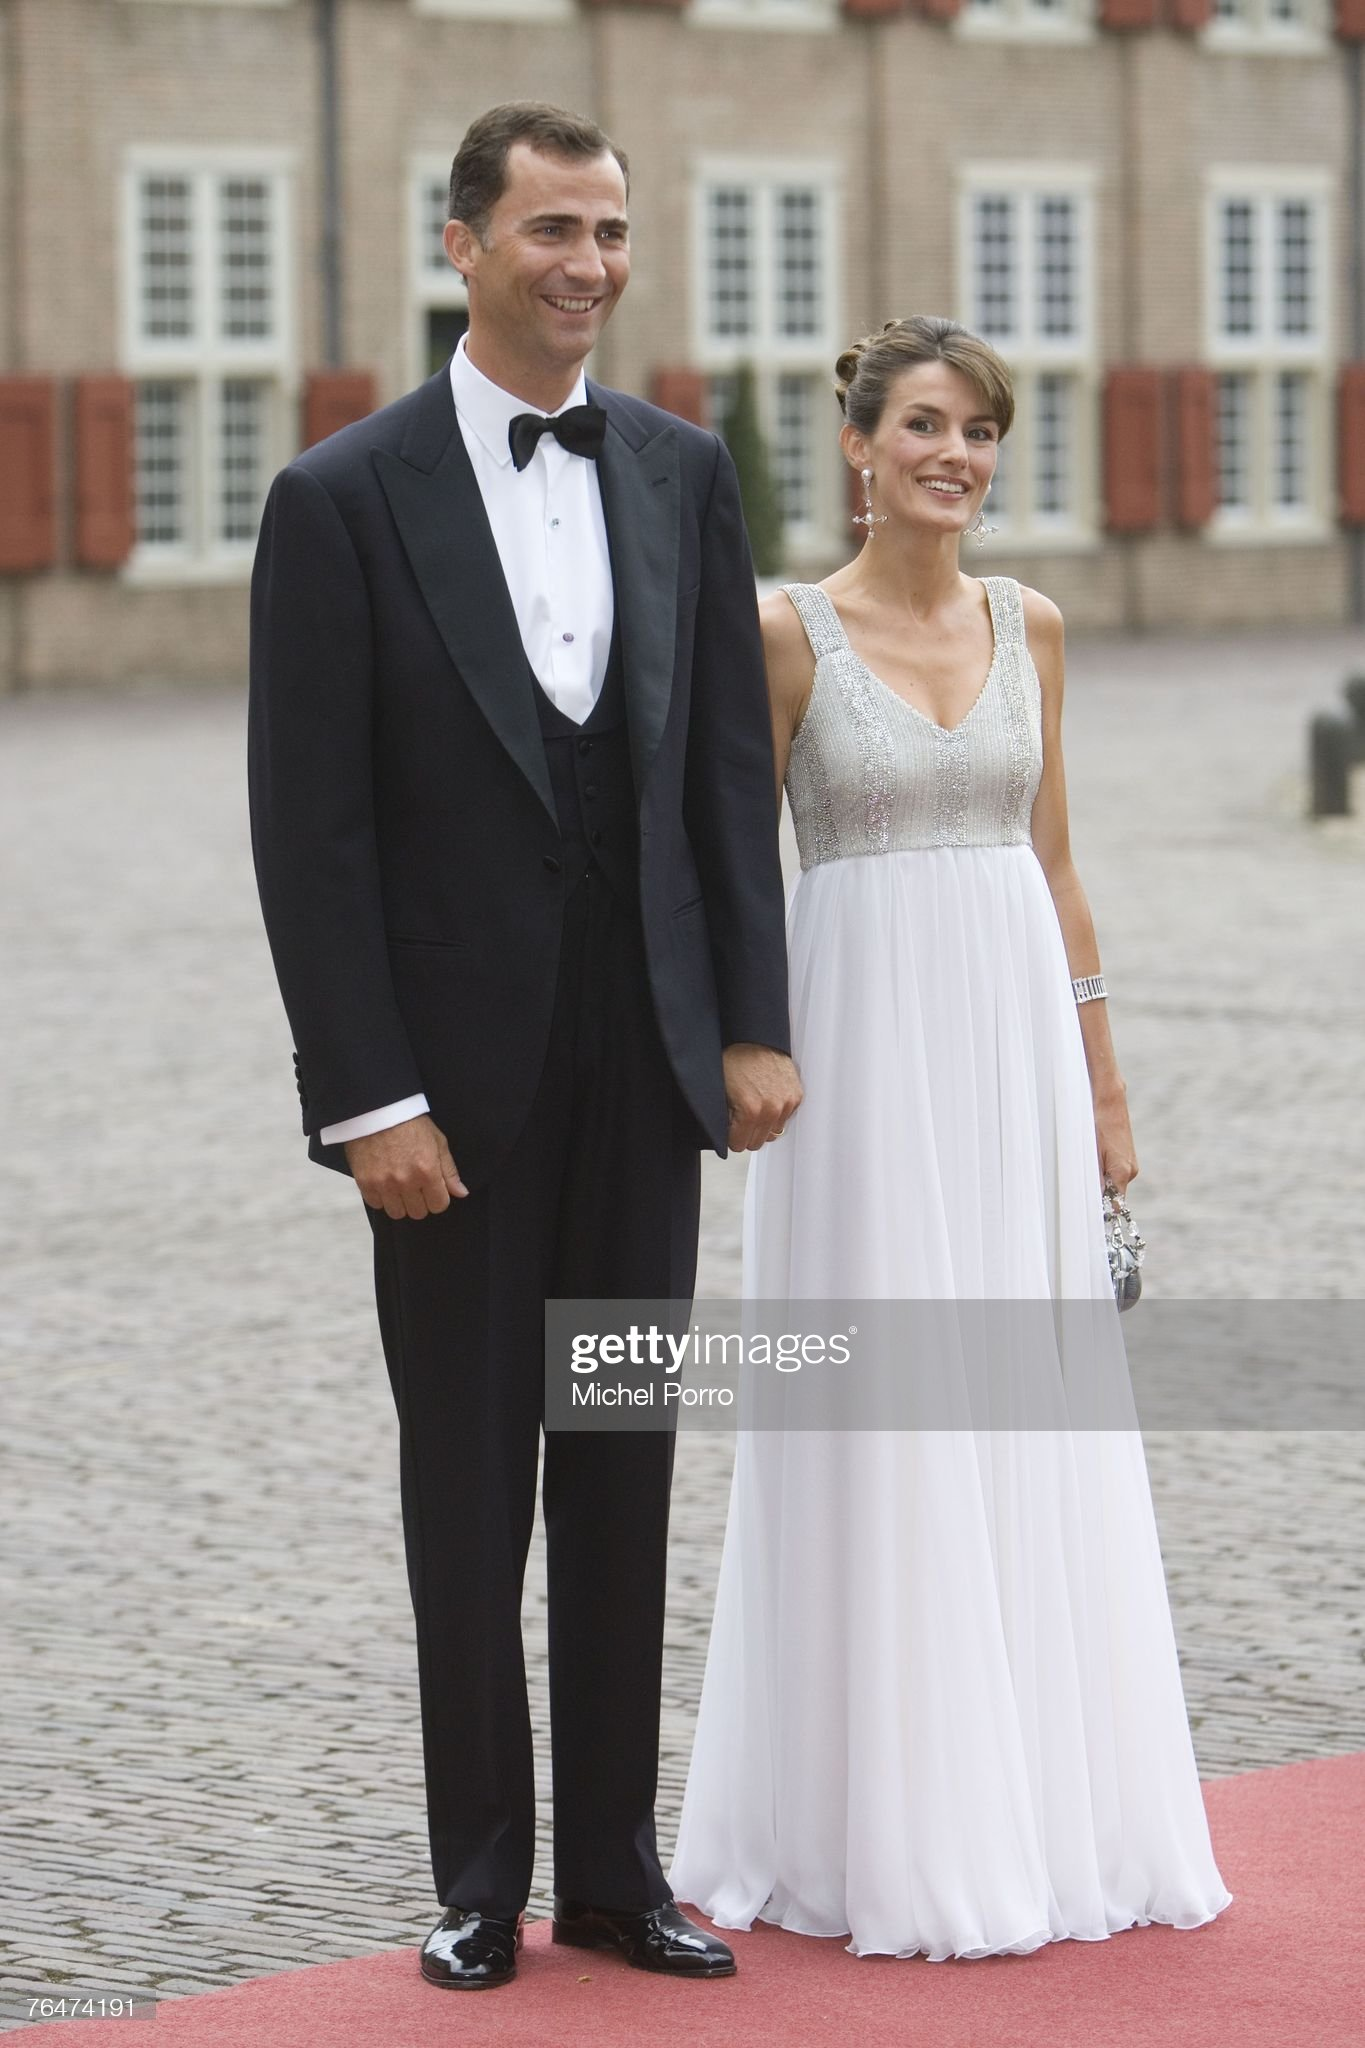 Вечерние наряды Королевы Летиции Prince Willem Alexander Of The Netherlands- 40th Birthday Party : News Photo